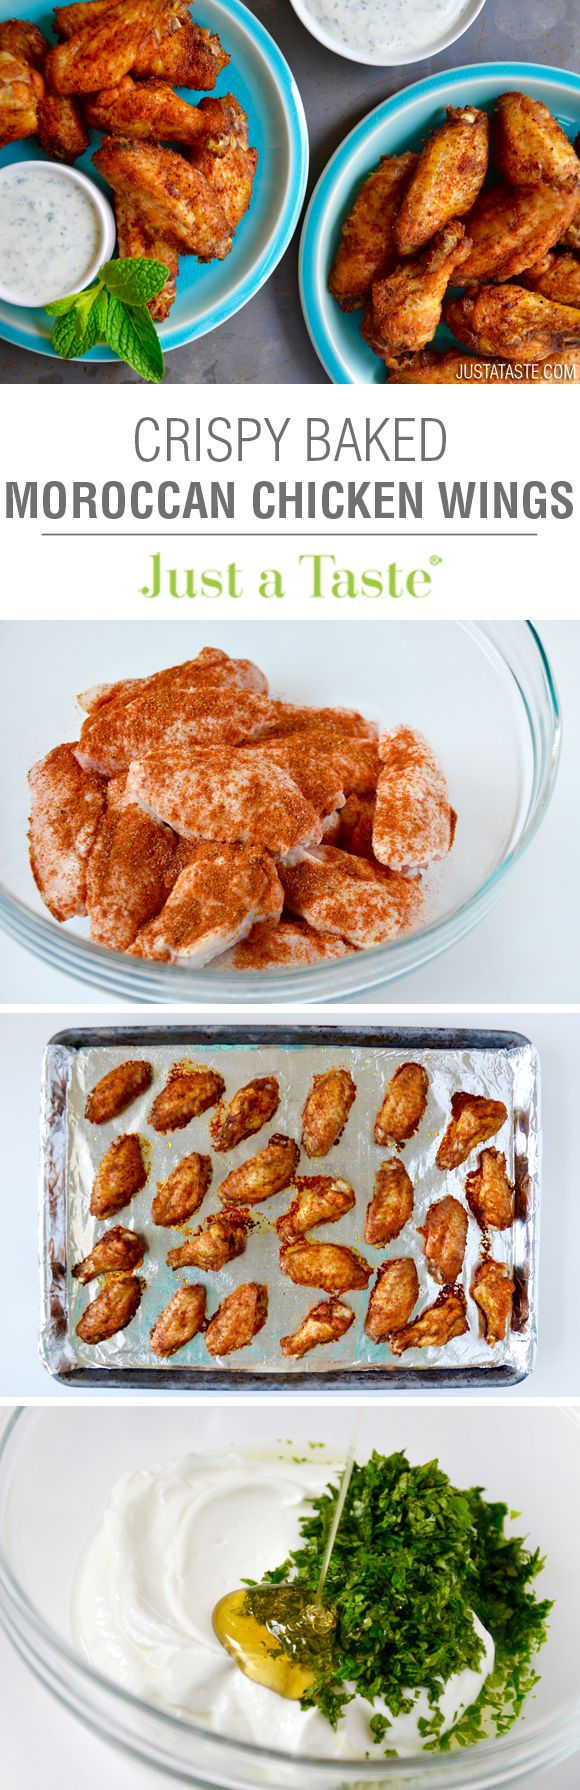 Crispy Baked Moroccan Chicken Wings with Yogurt Dip | recipe via justataste.com